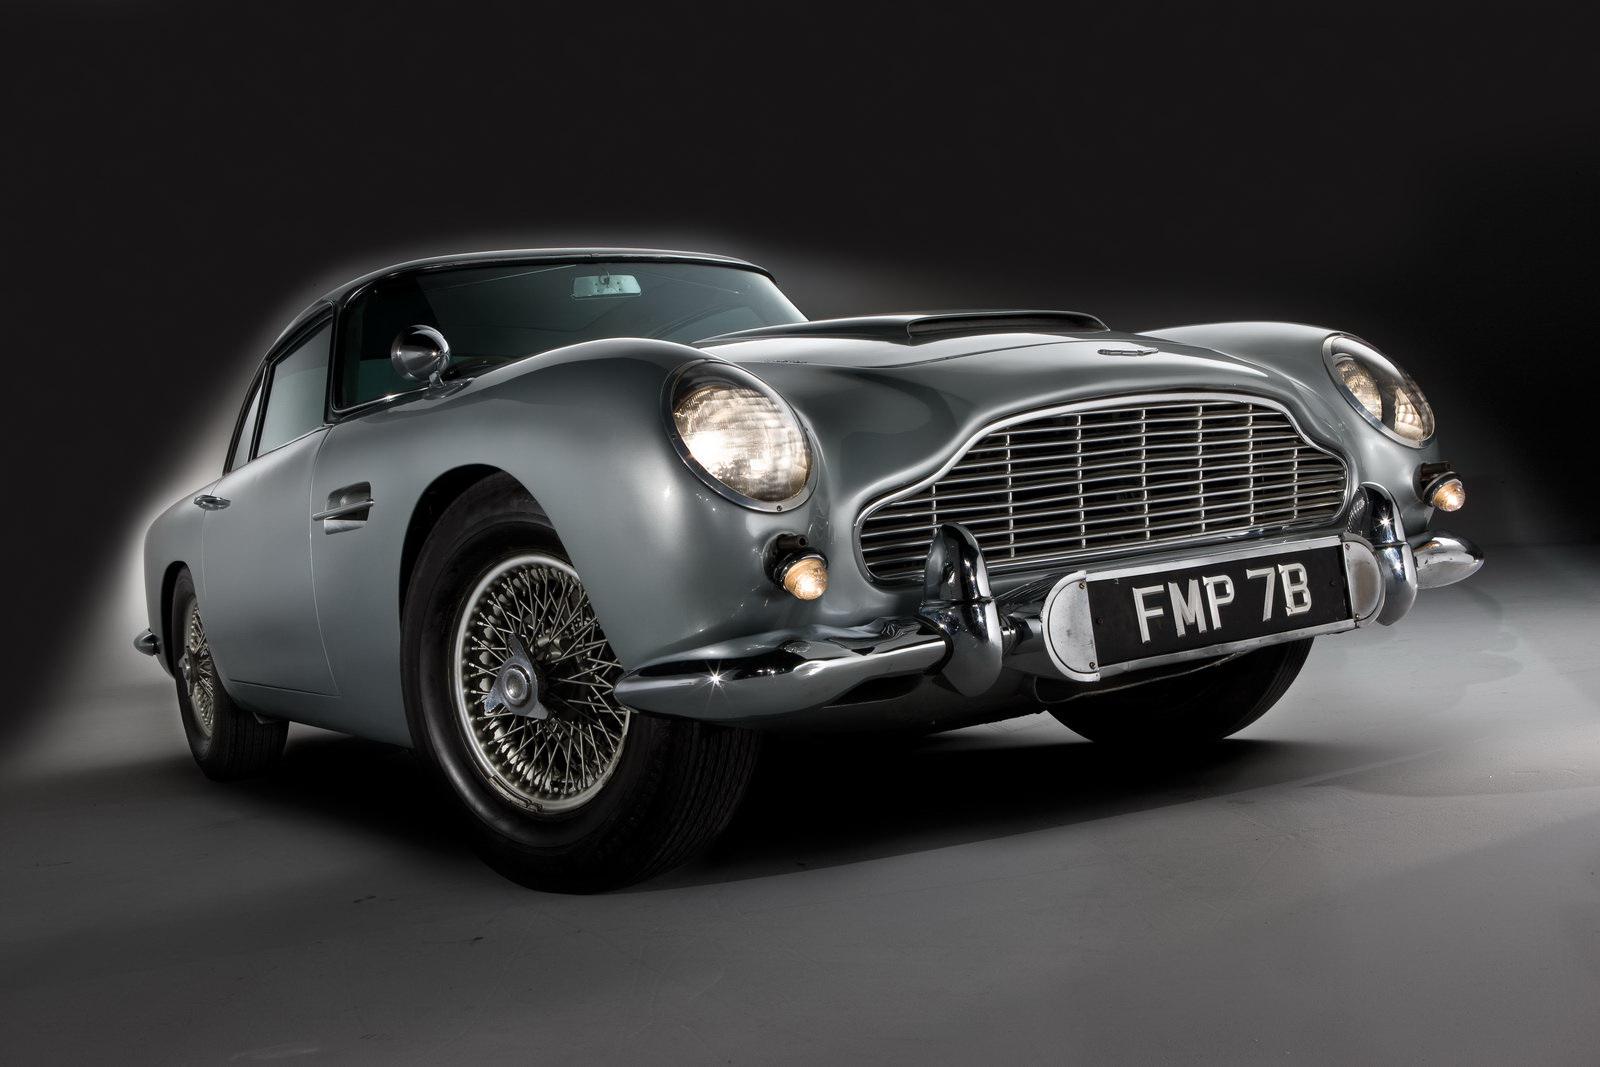 aston martin james bond classic car download free hd wallpapers. Black Bedroom Furniture Sets. Home Design Ideas